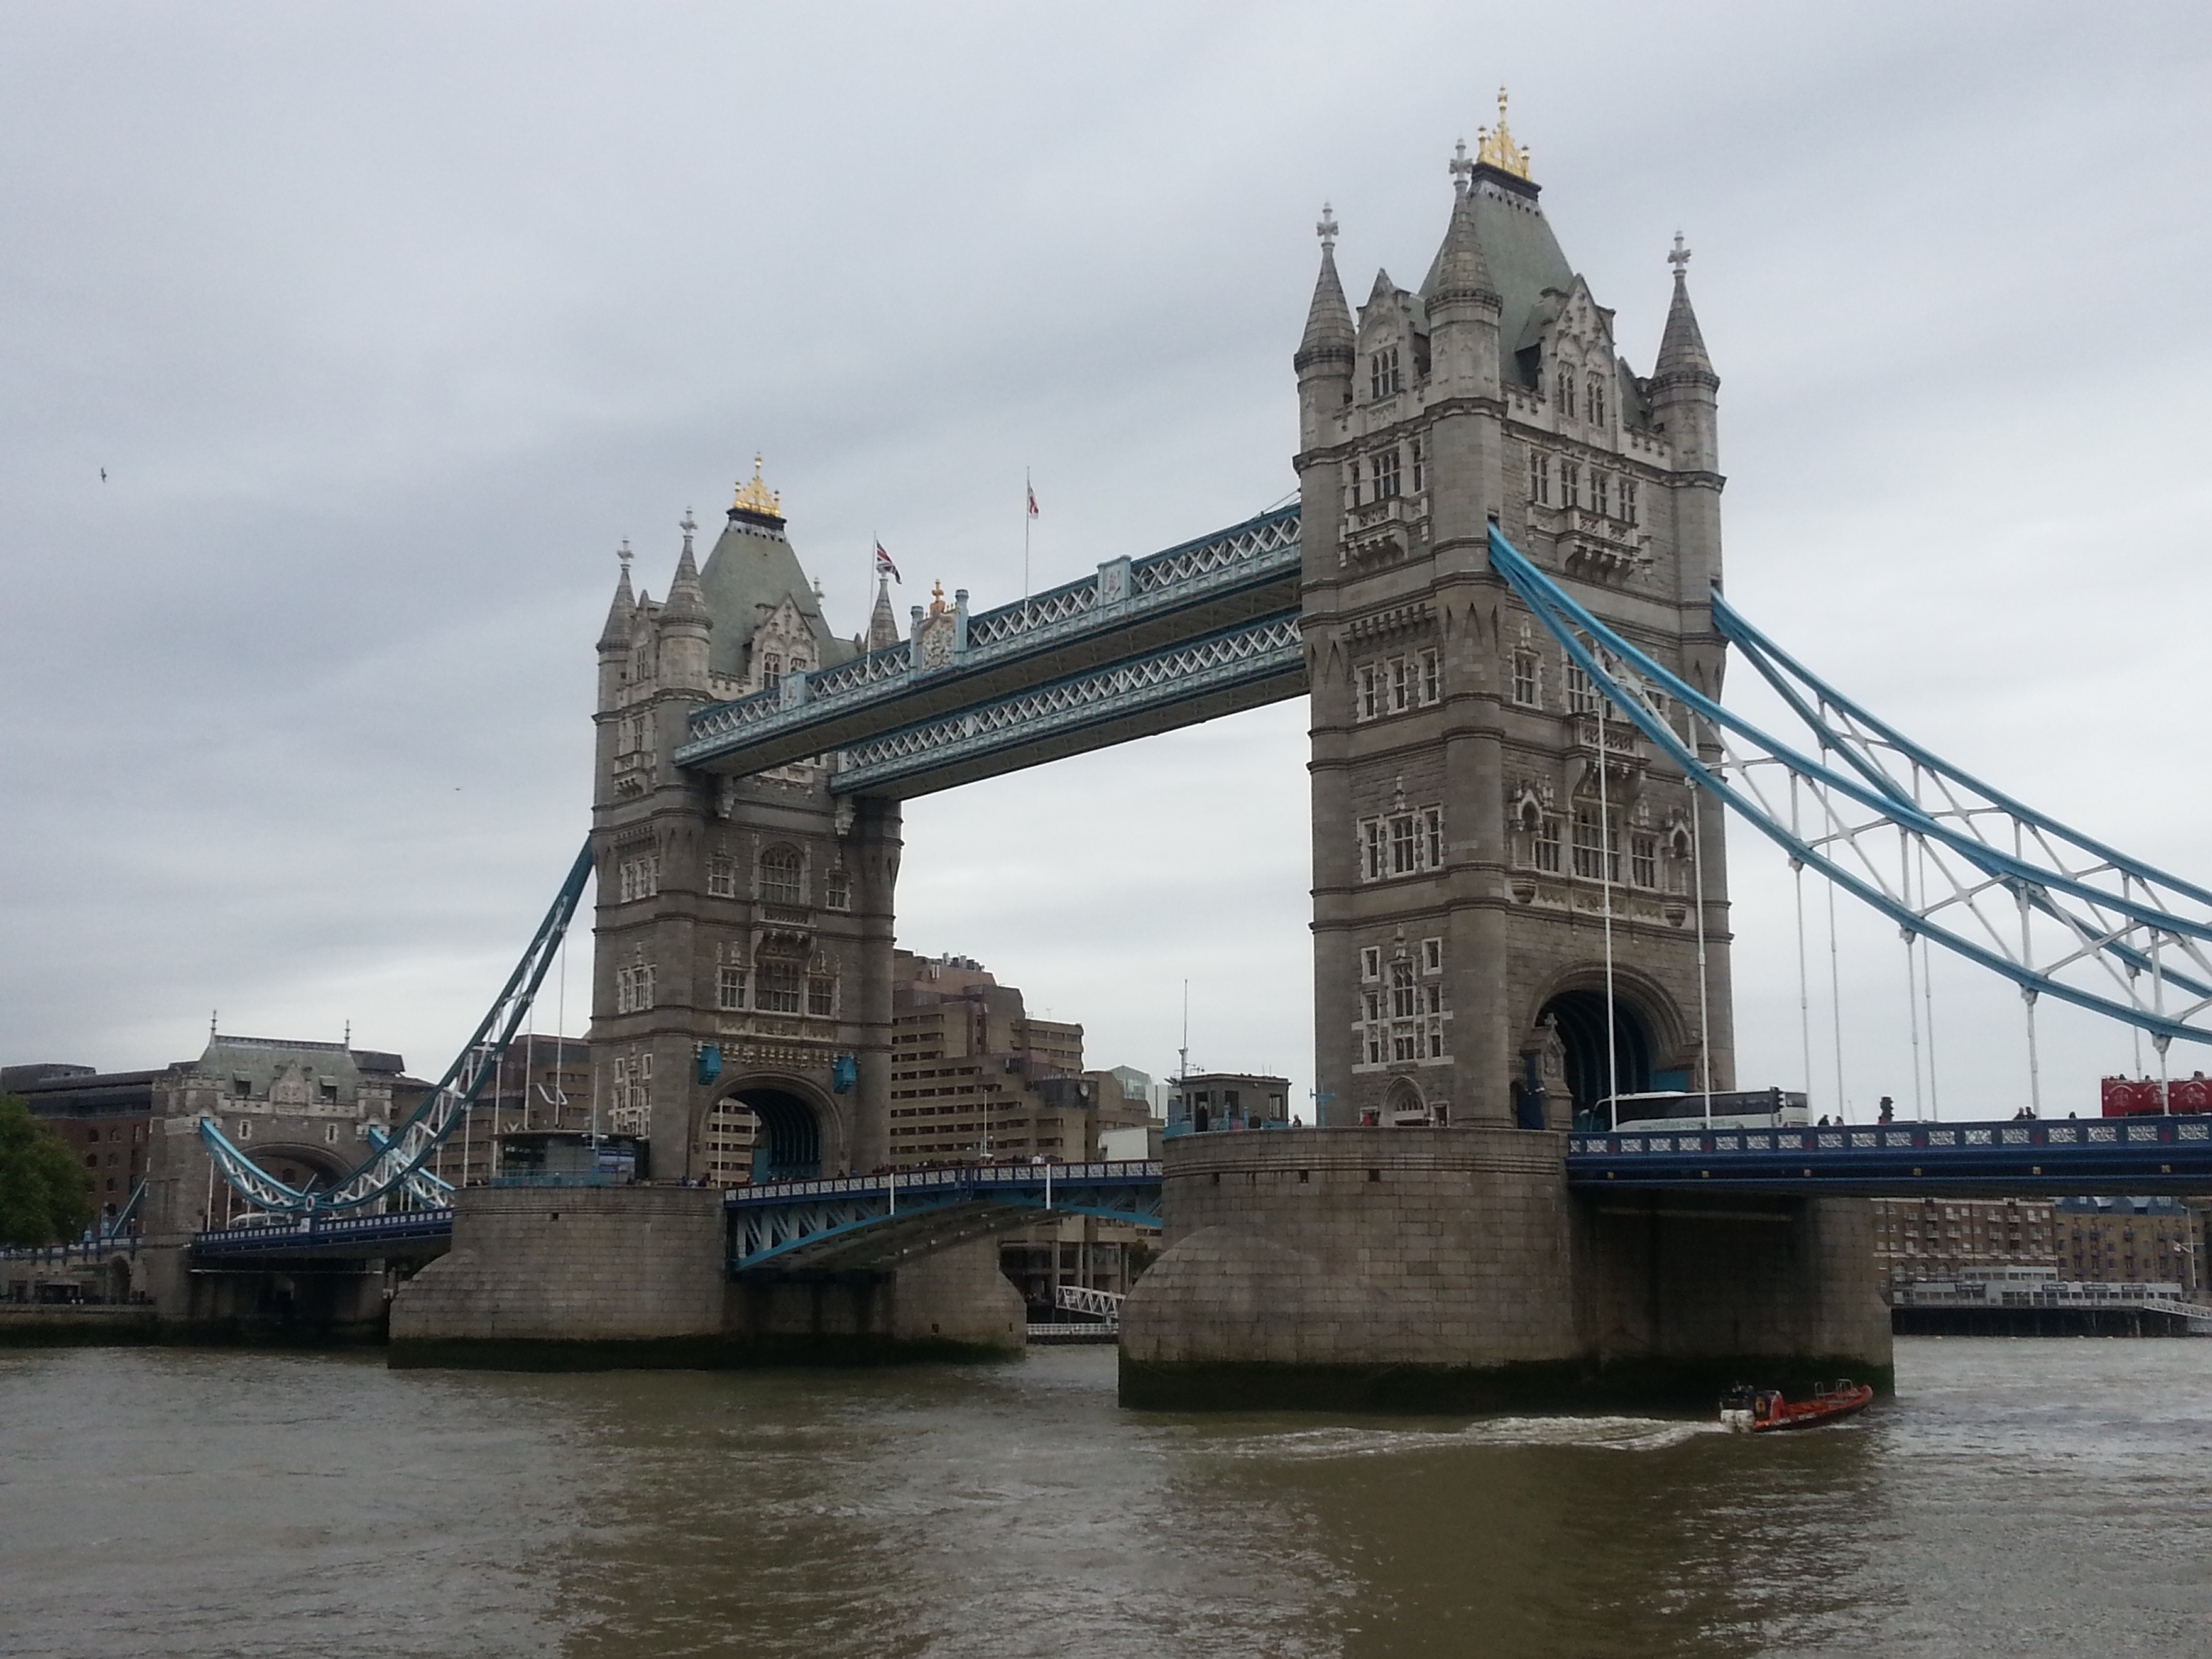 idee per risparmiare soldi bridge